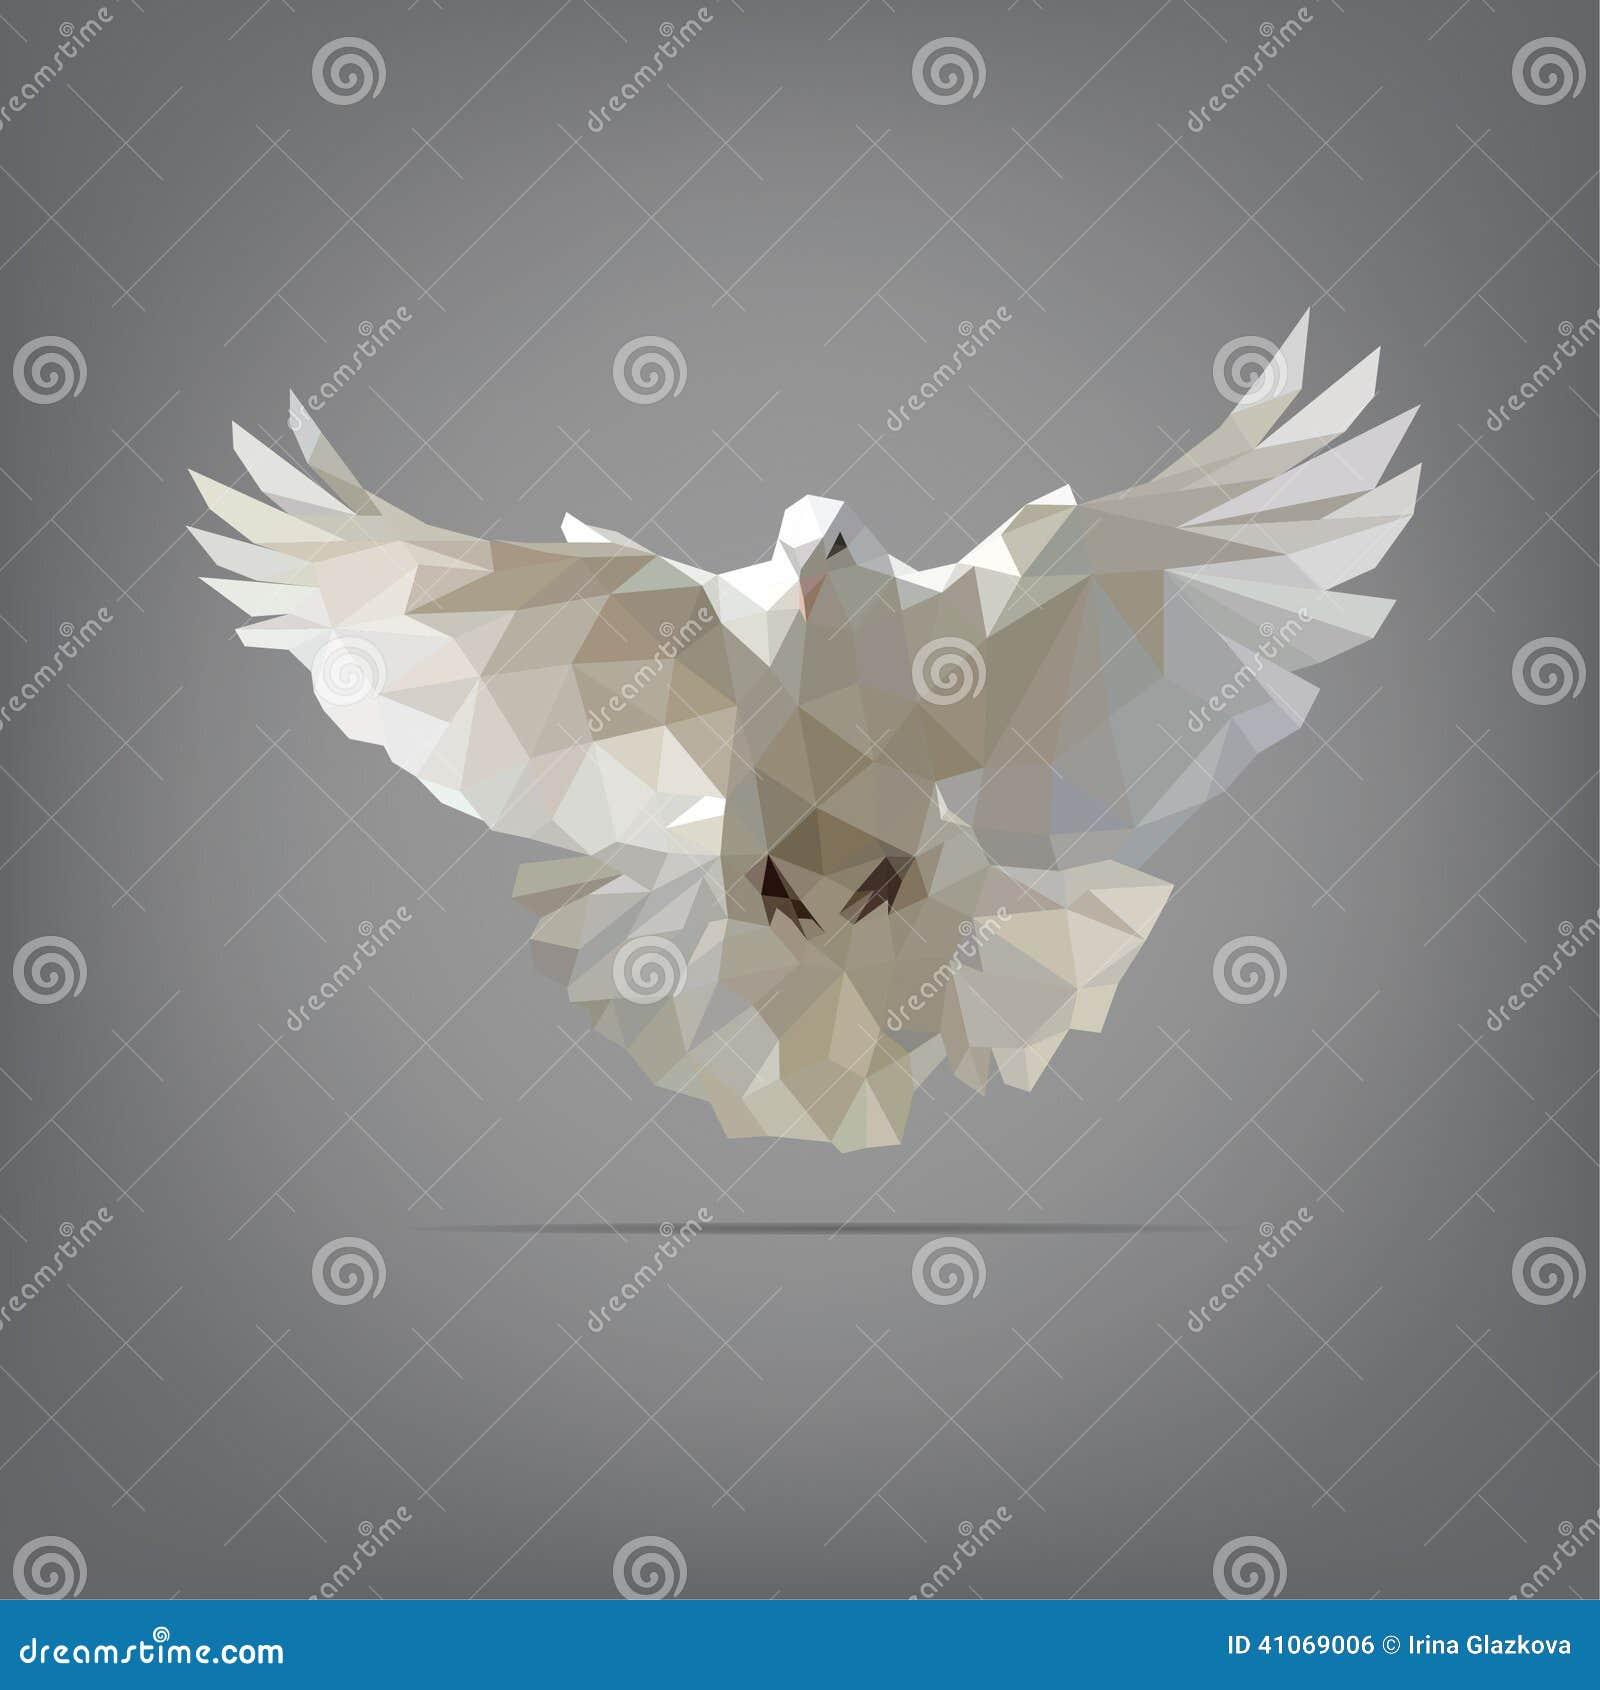 Dove In Origami Style. Vector Illustration Stock Vector ... - photo#34